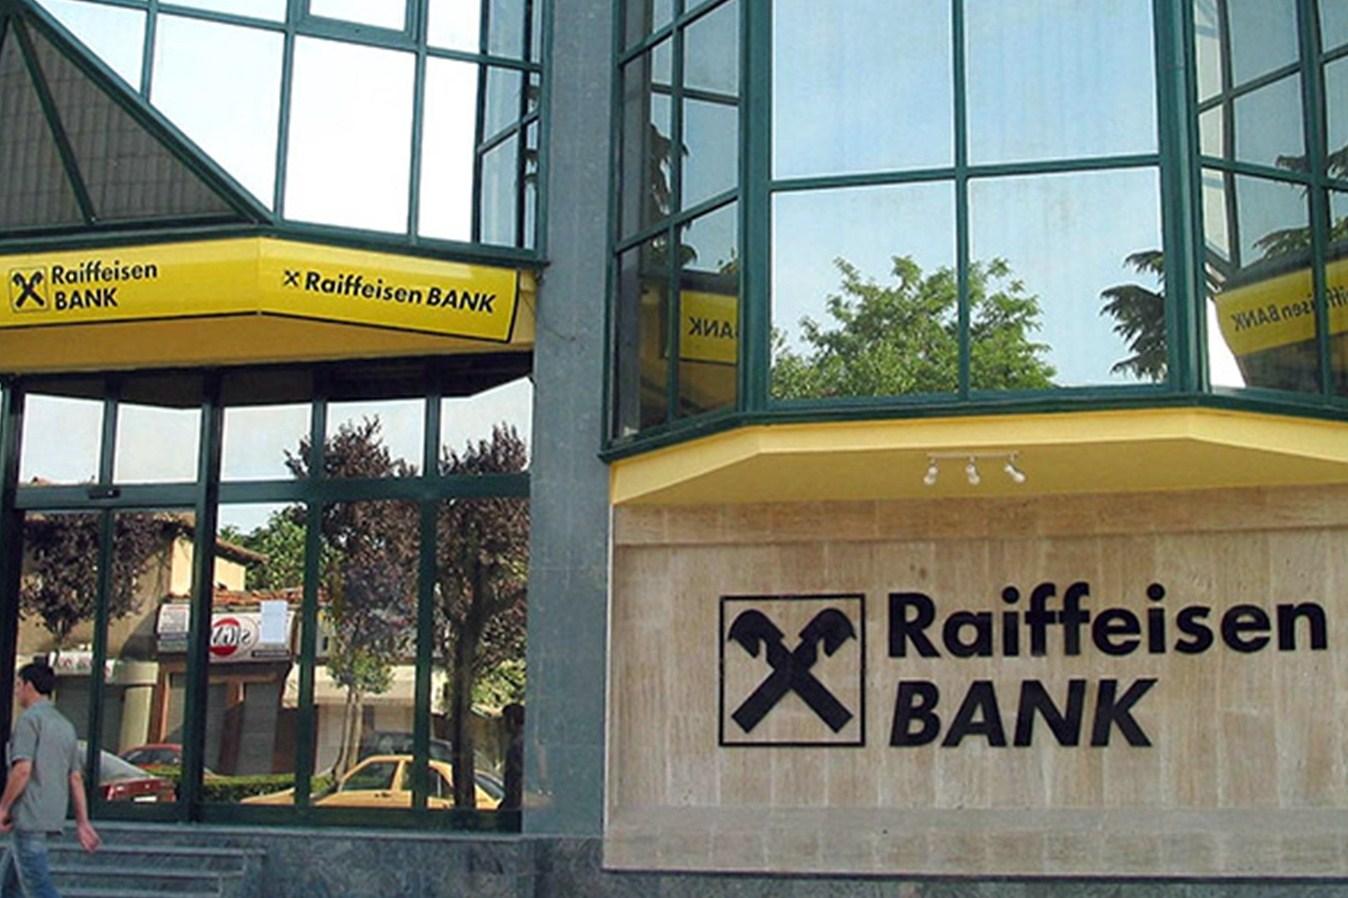 как отказаться от страховки по кредиту в Райффазен банке